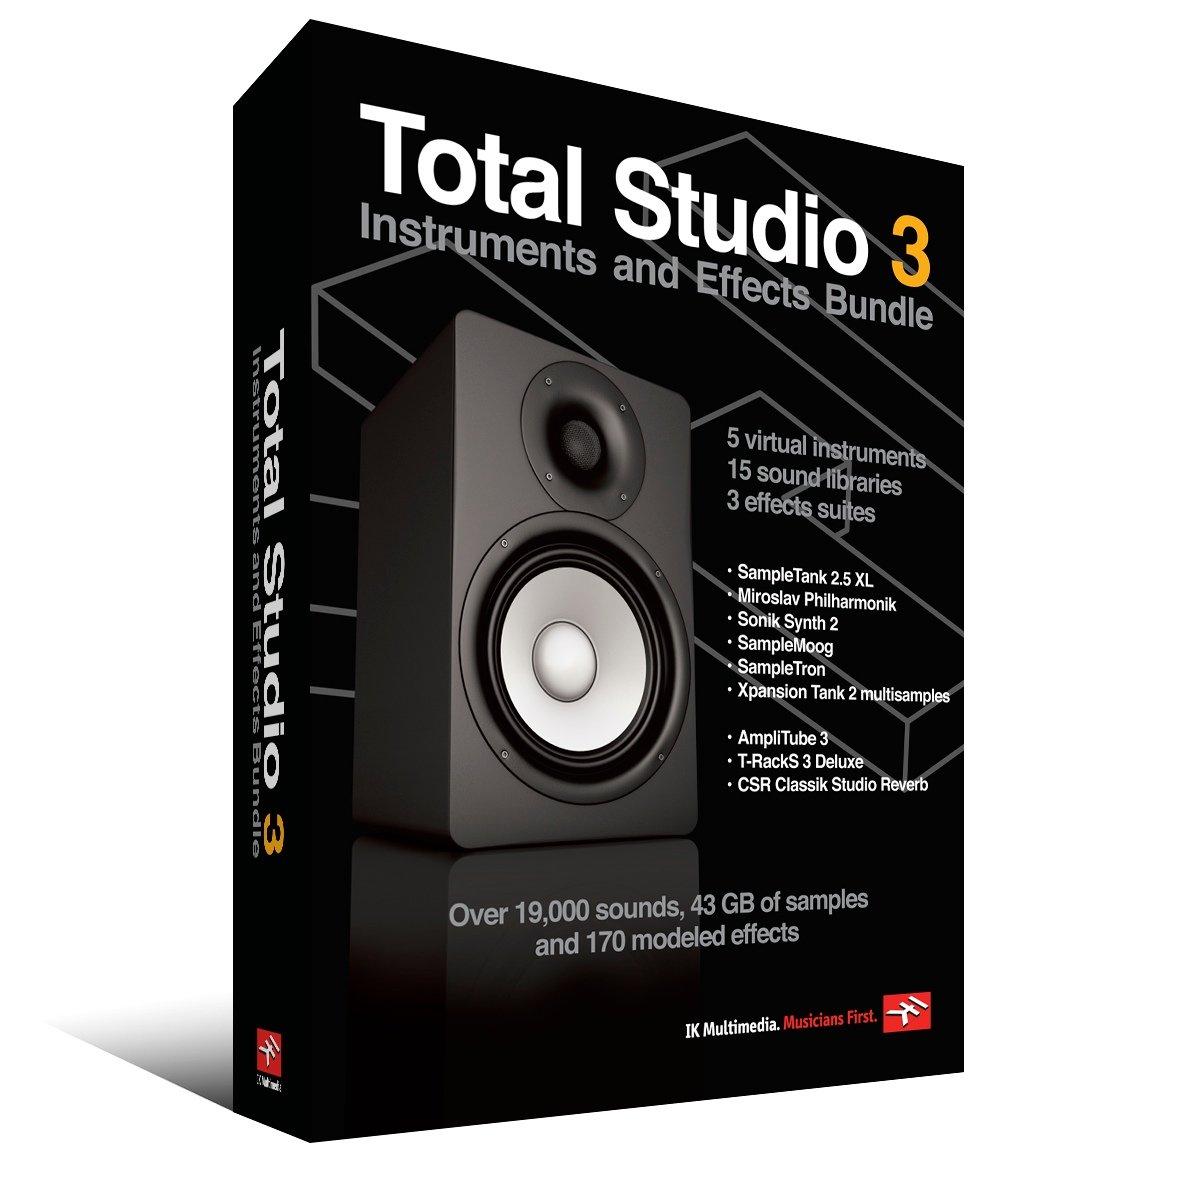 IK Multimedia Total Studio Bundle 3